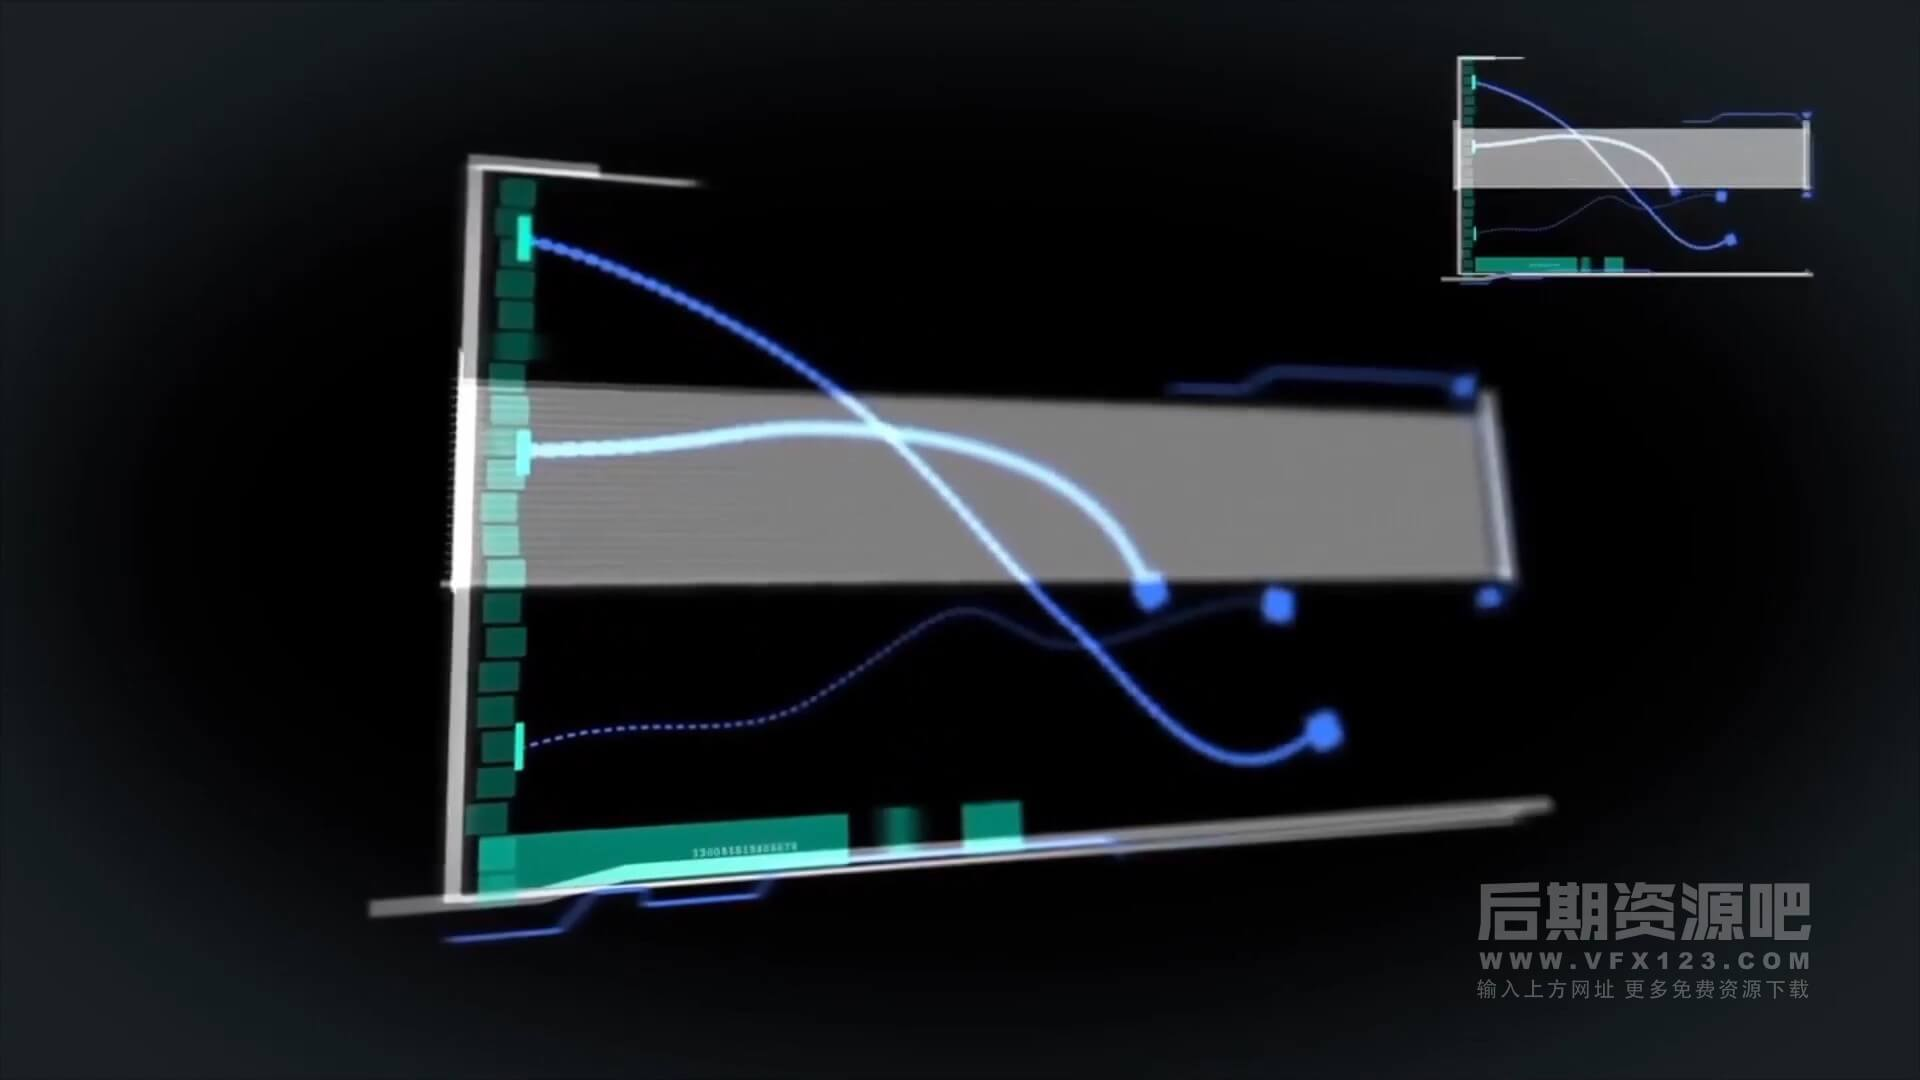 fcpx插件 20个超现代科技HUD全息图表动画元素 HUD Elements Pack